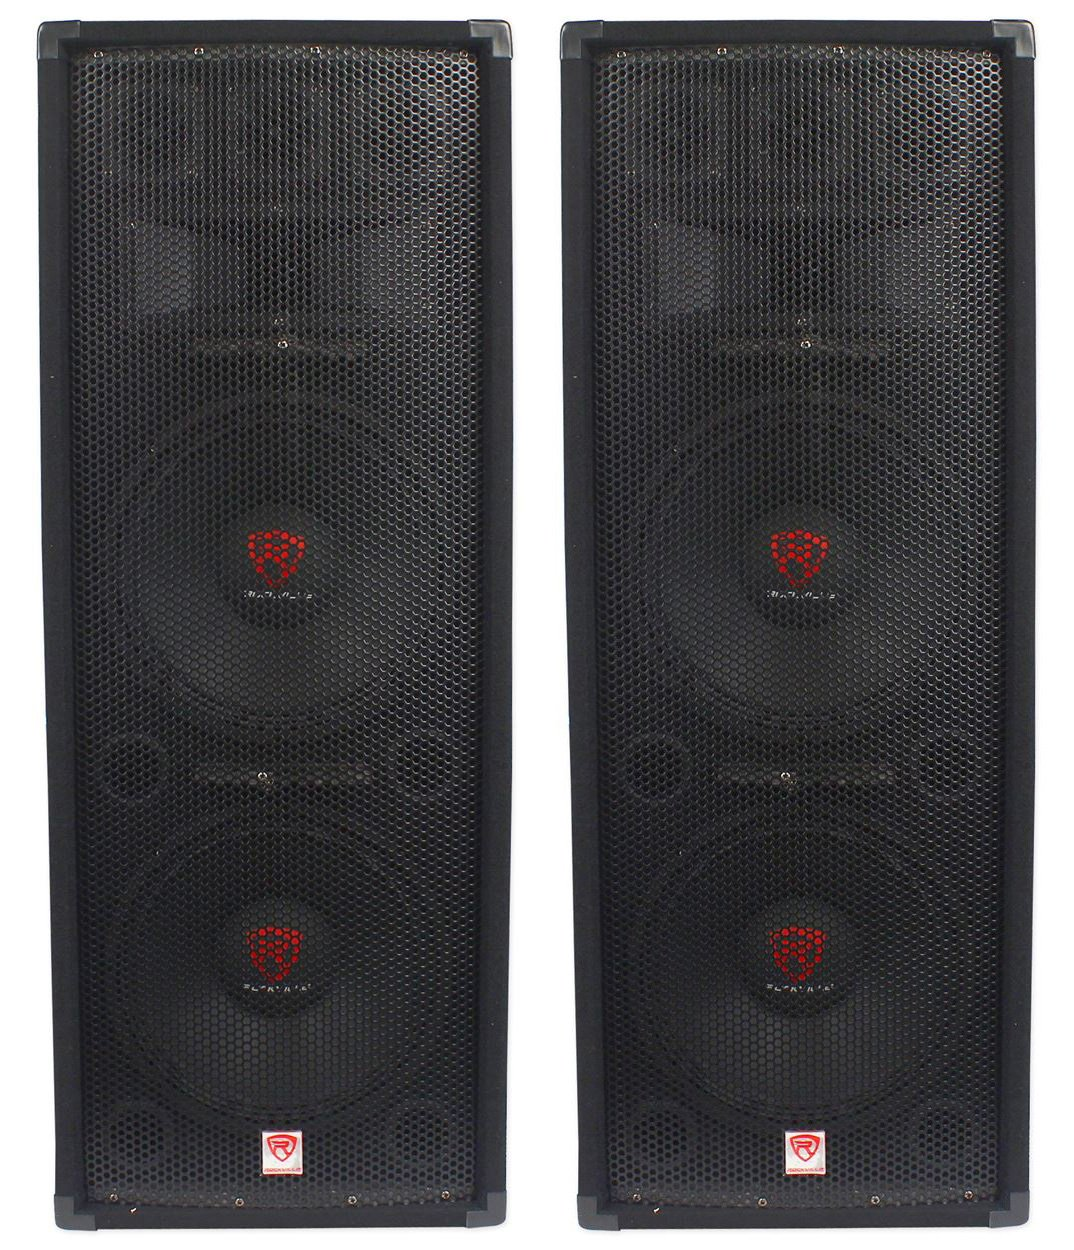 "(2) Rockville RSG12.28 Dual 12"" 2000 Watt 8-Ohm Passive Pro Audio PA Speakers"